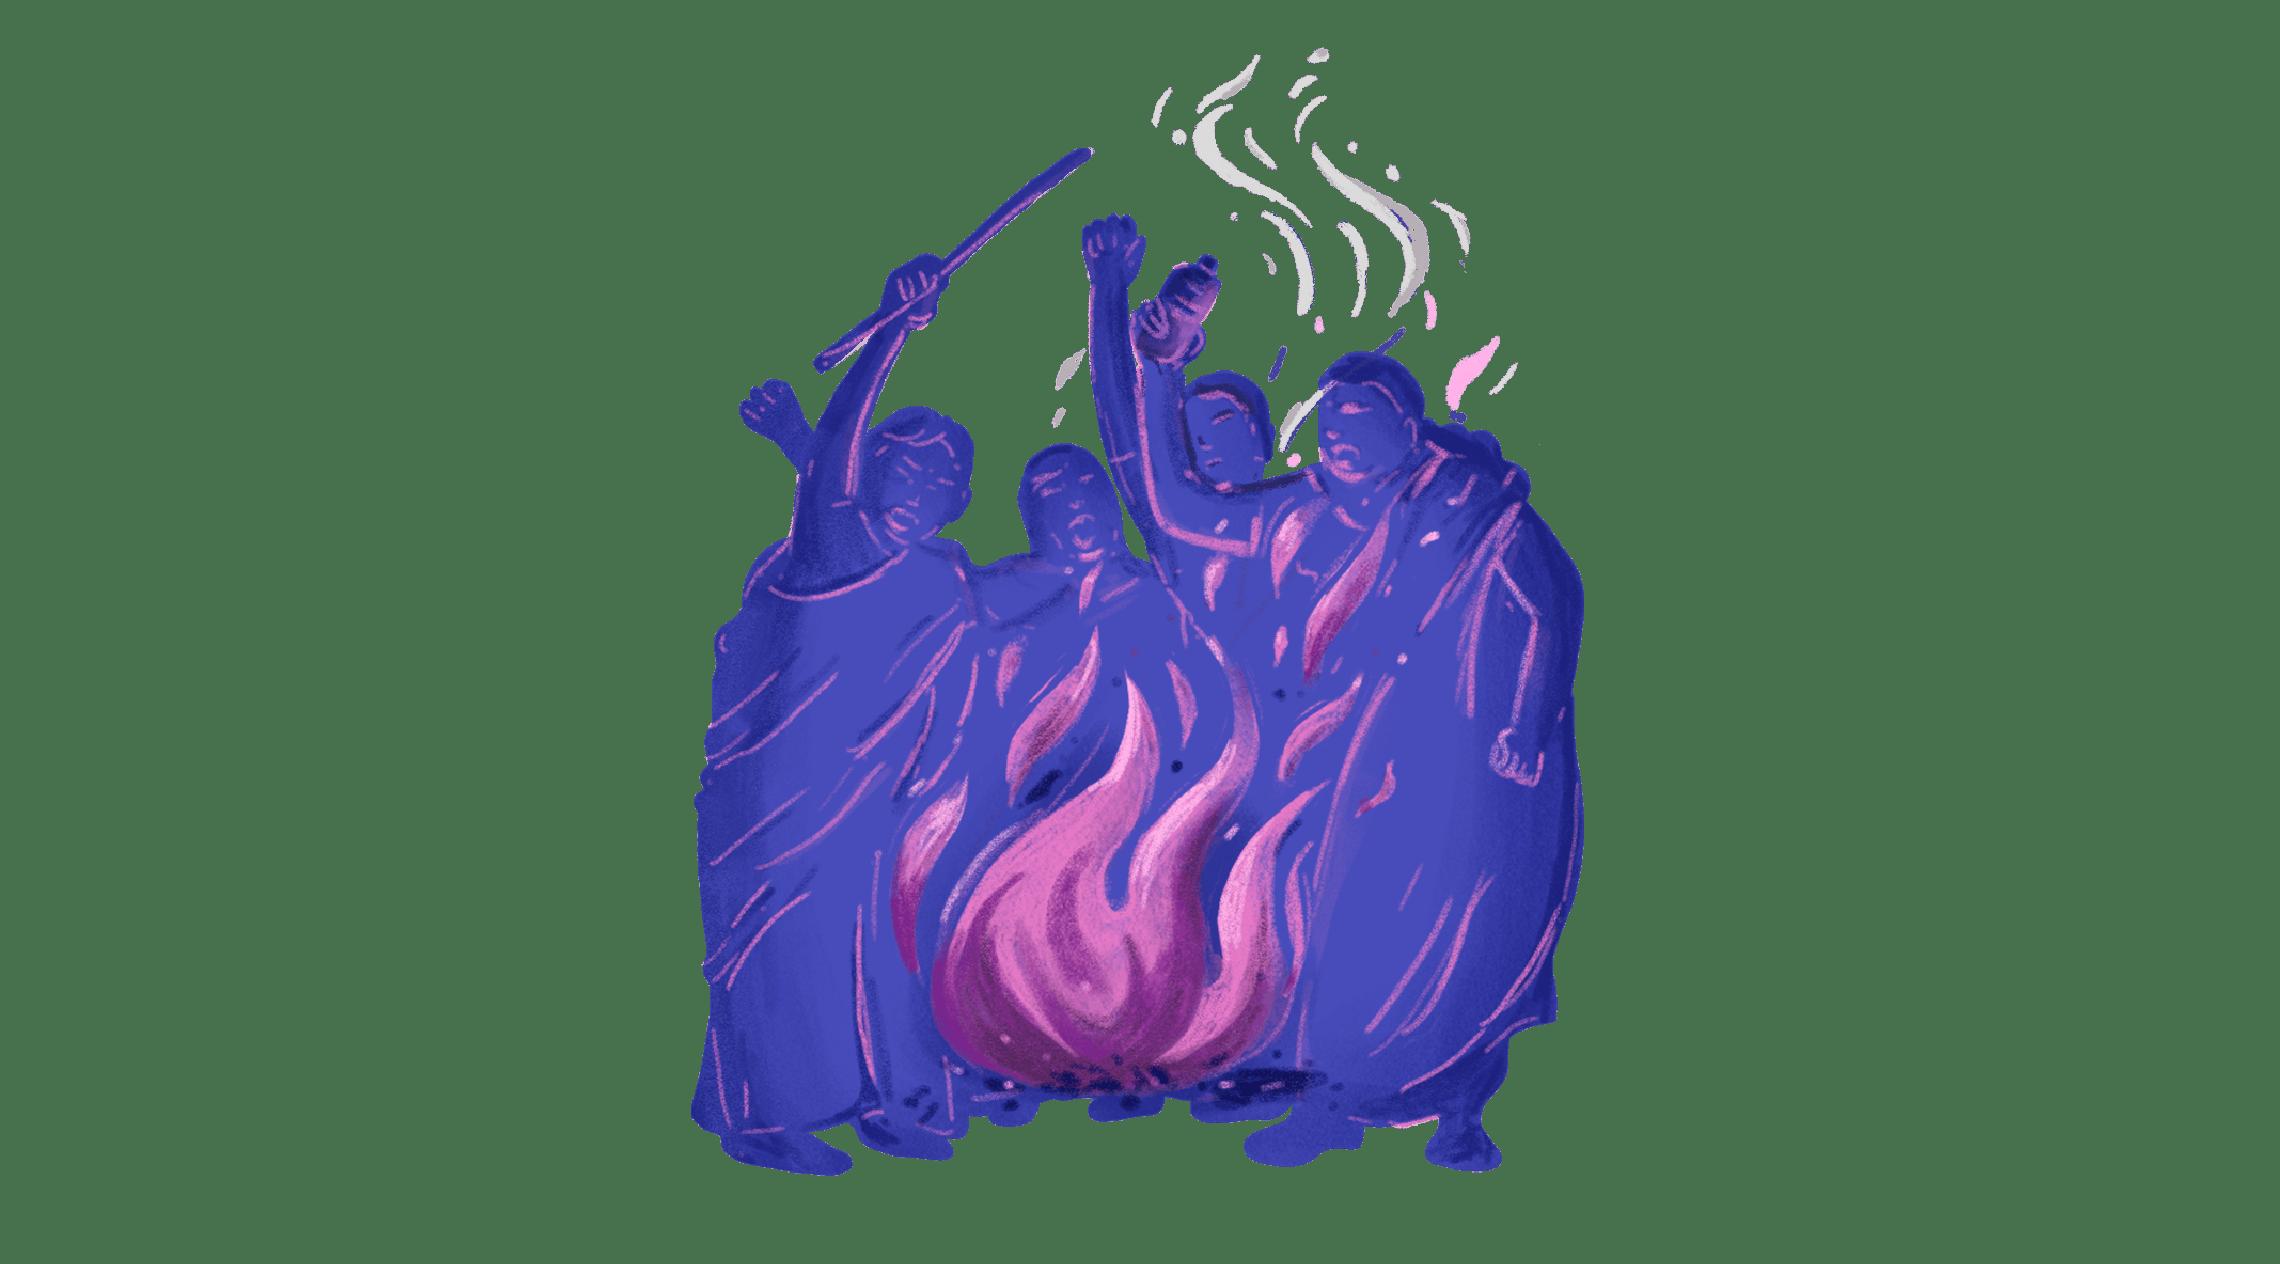 Smashed - Namrata Kolachalam; Illustration by Akshaya Zachariah